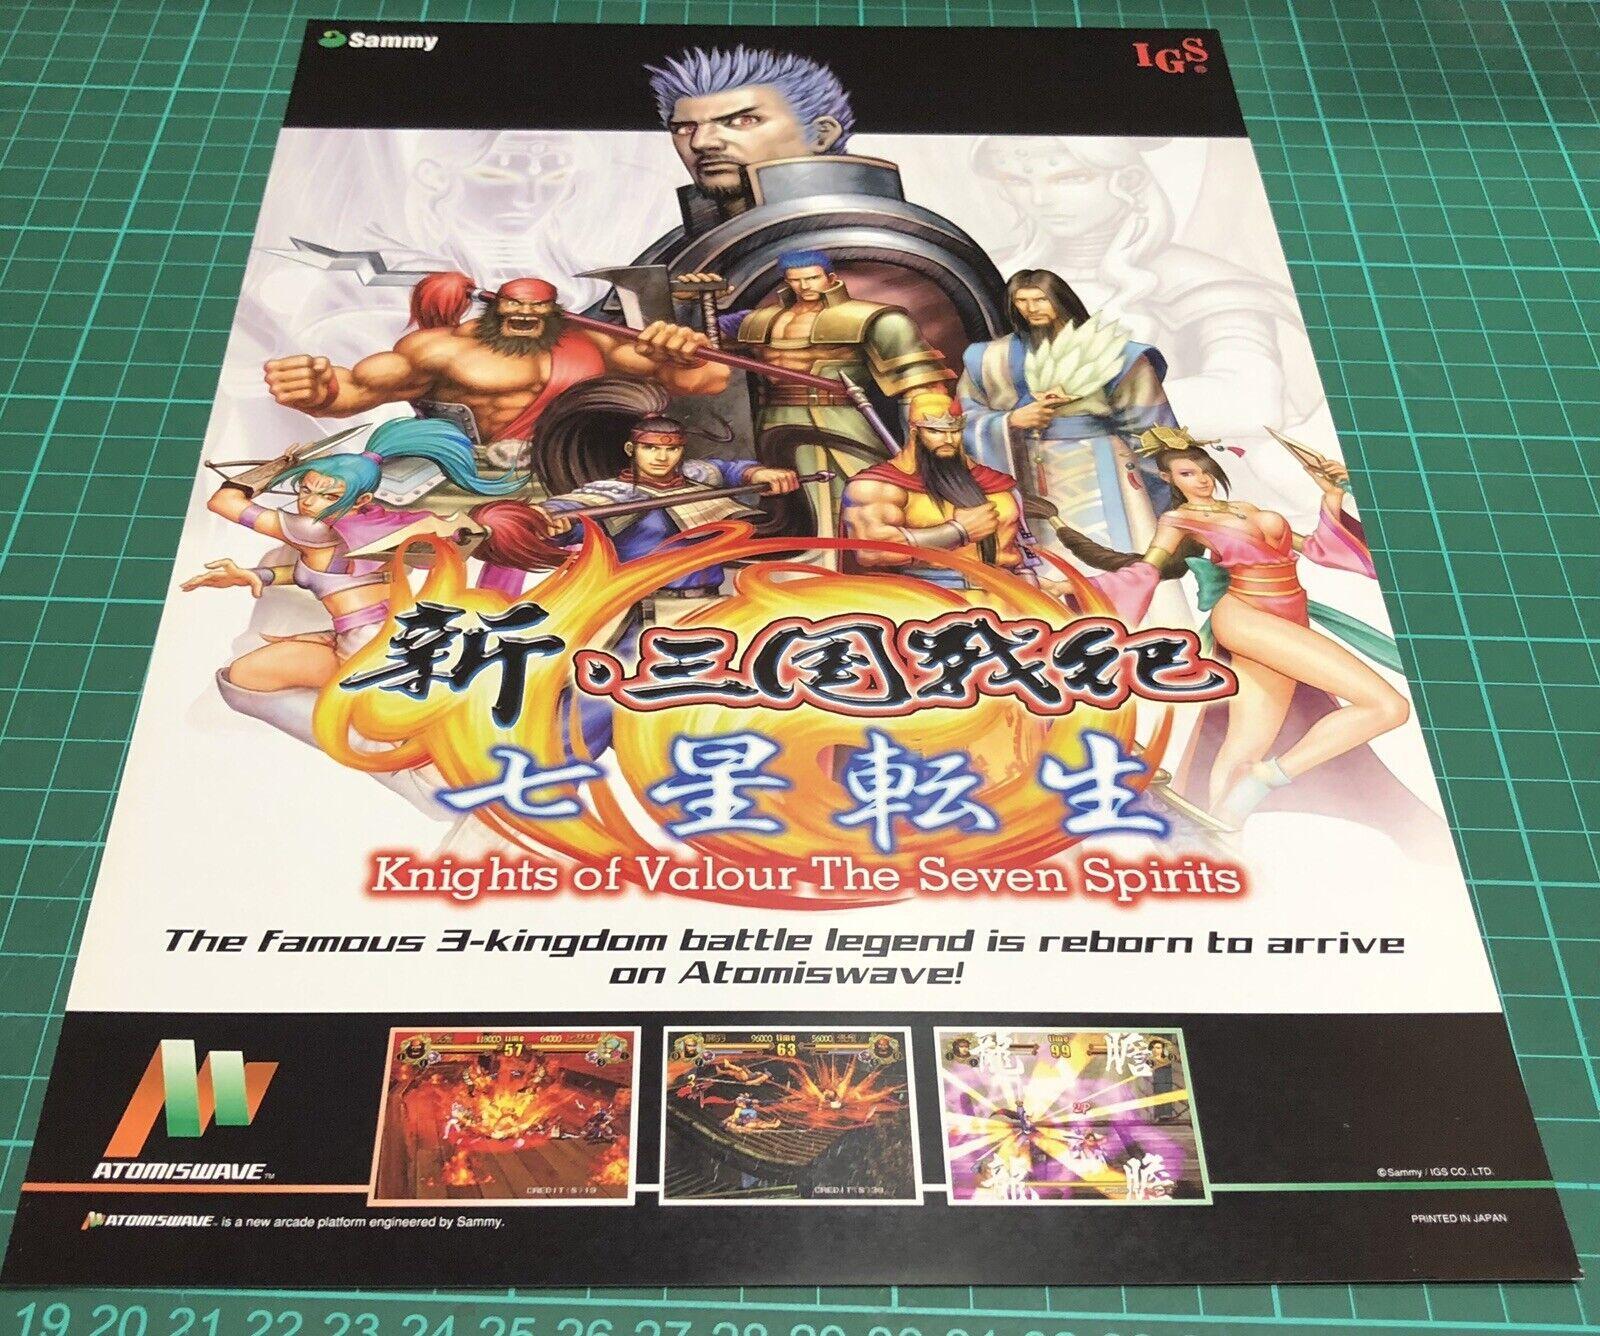 Sammy Atomiswave Knights Of Valour The Seven Spirits Arcade Videogame Flyer